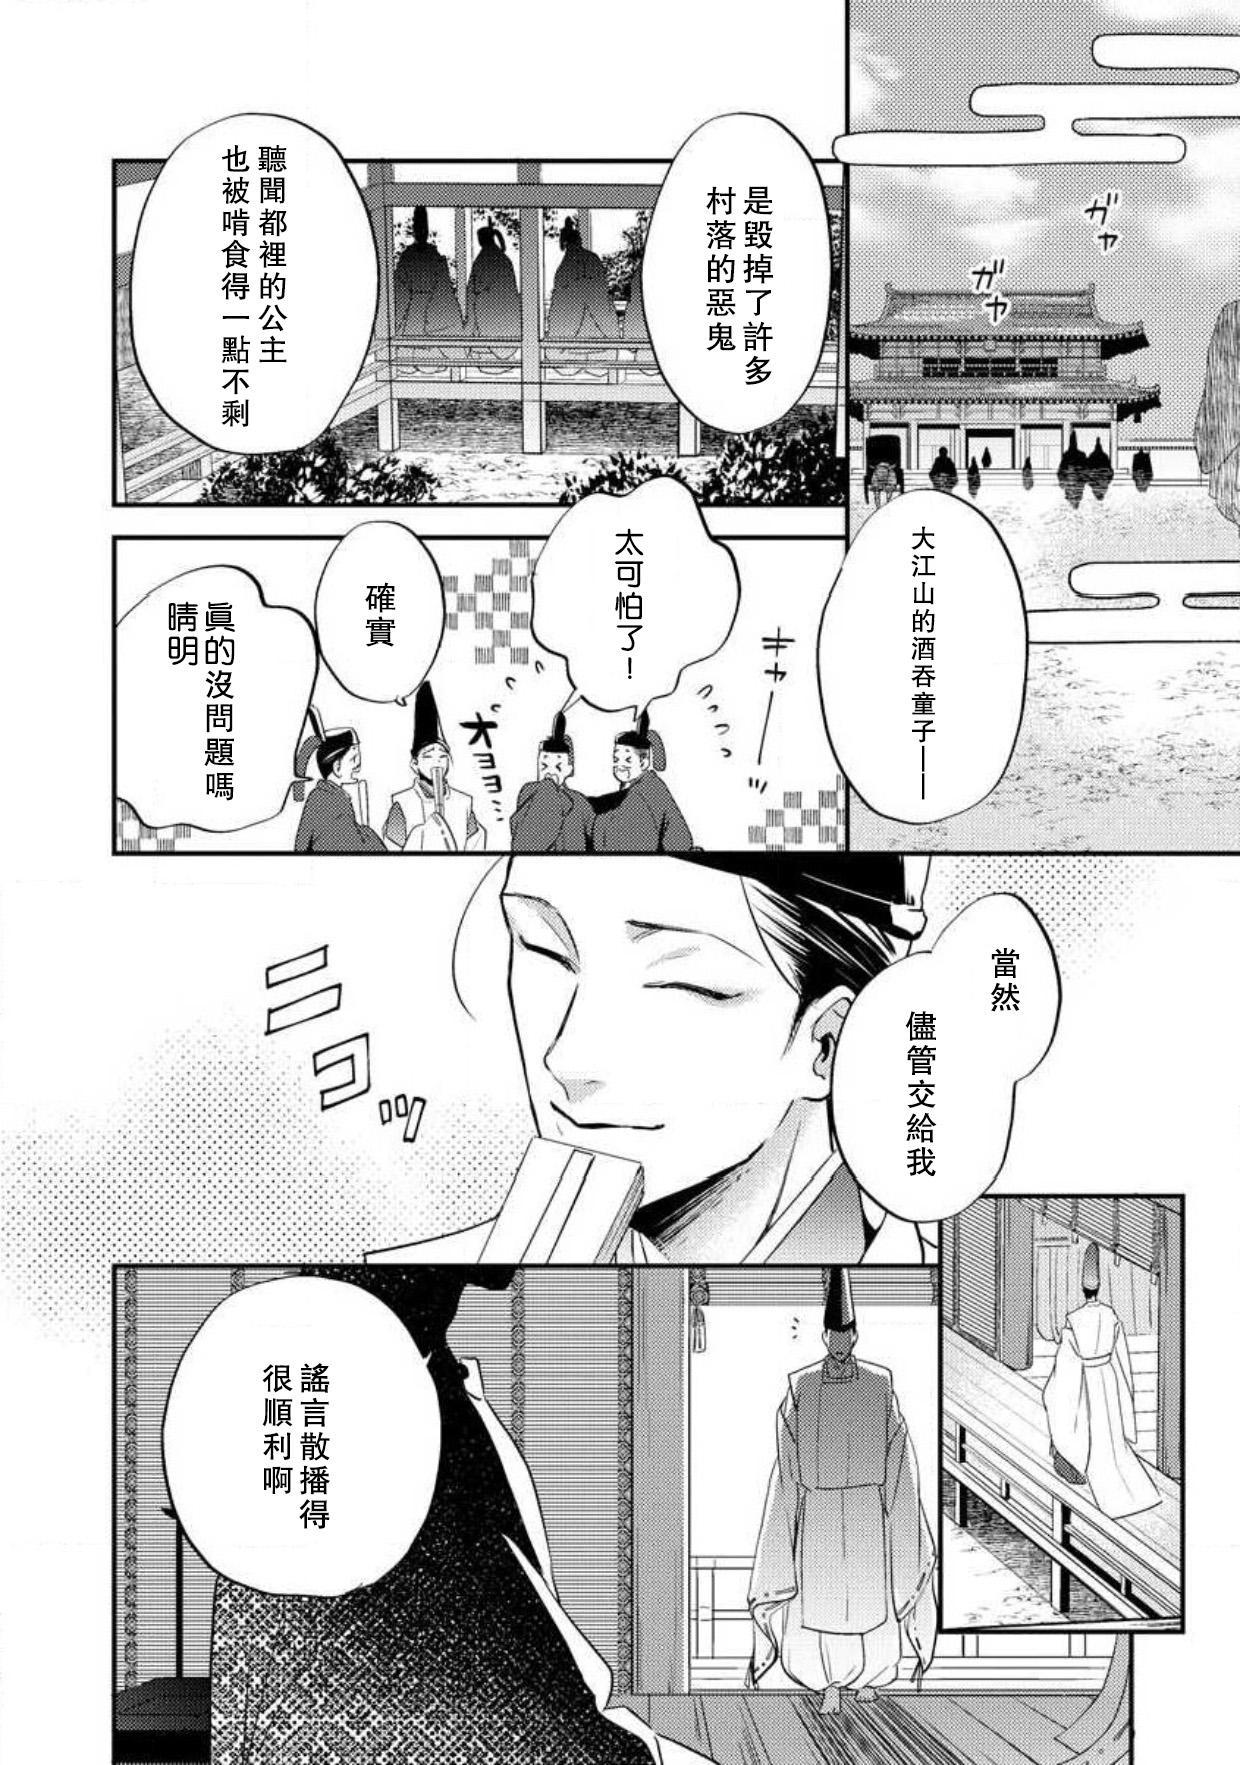 Oeyama suimutan utsukushiki oni no toraware hime | 大江山醉夢逸話 美麗的鬼與被囚禁的公主 Ch. 1-8 181